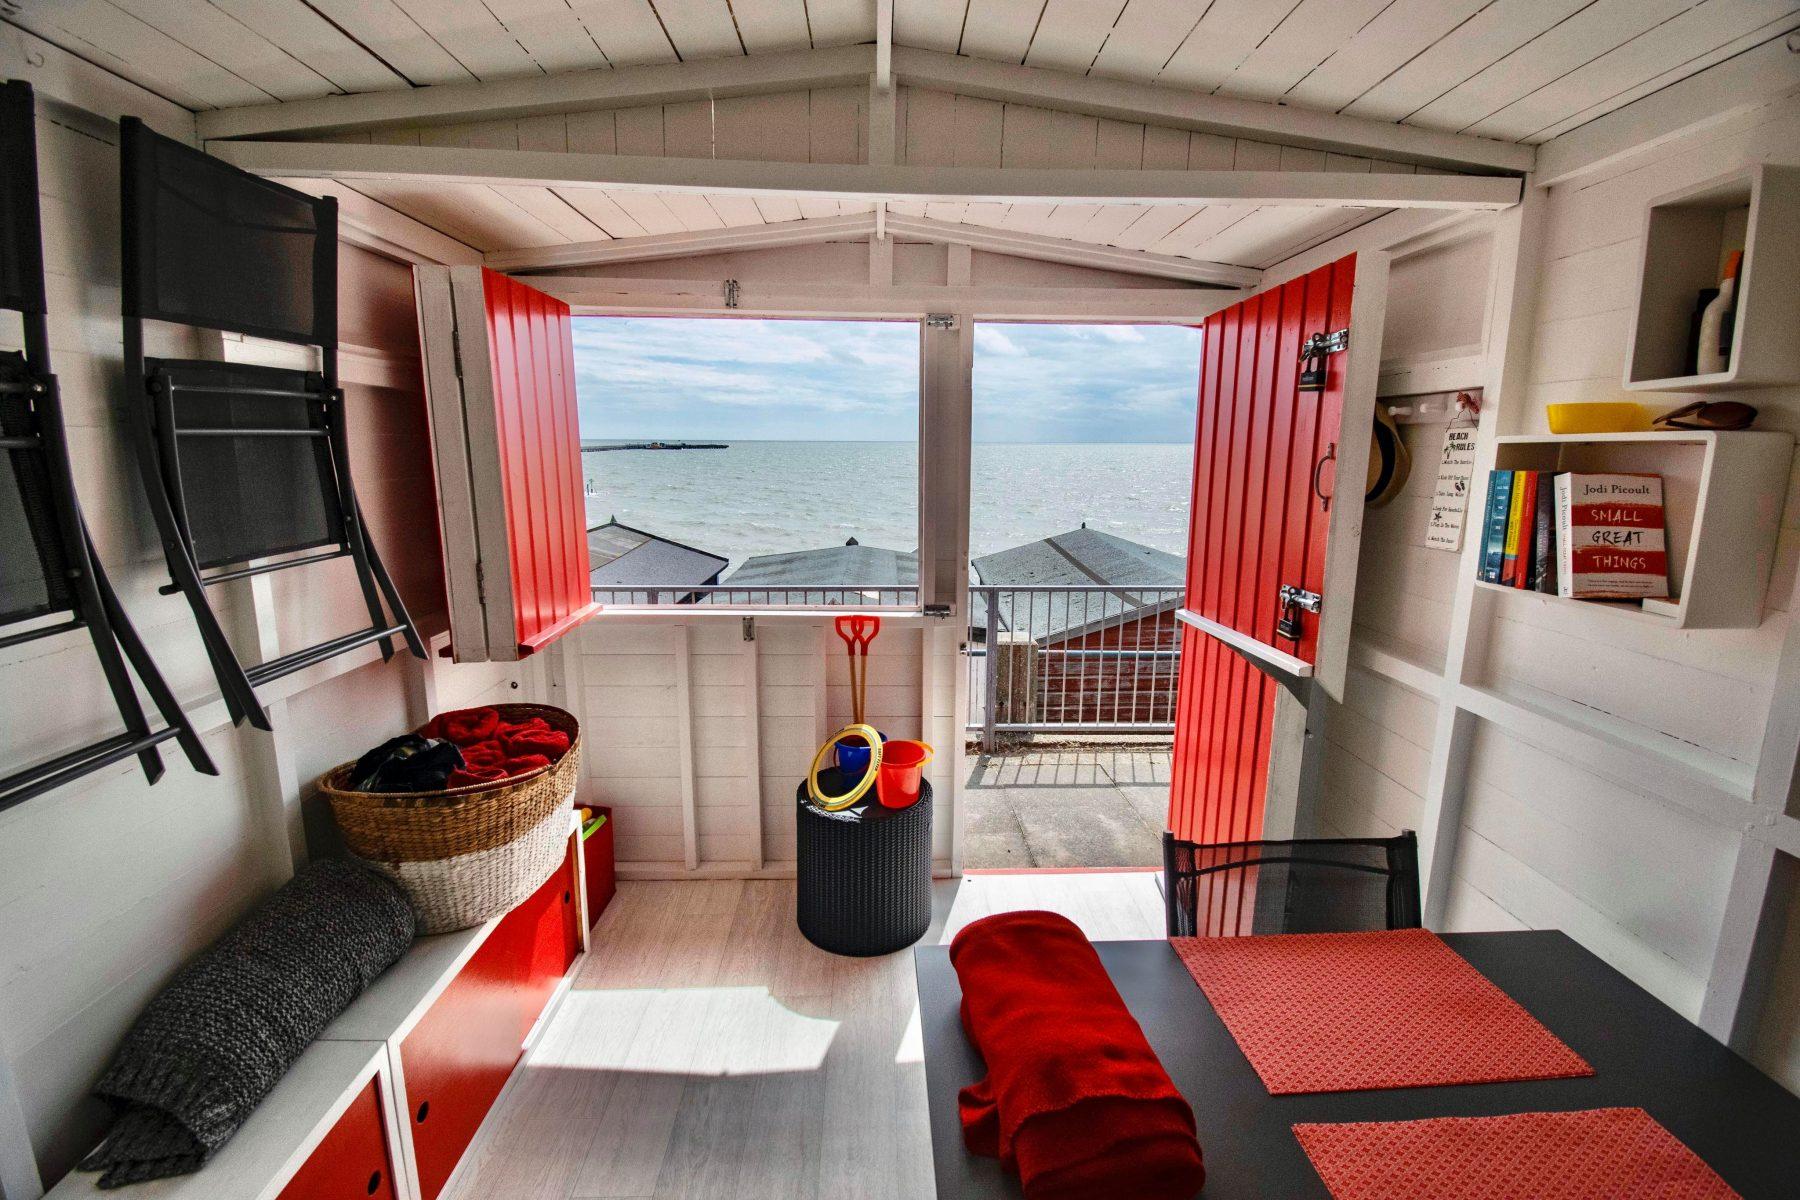 The Red Beach Hut Interior View